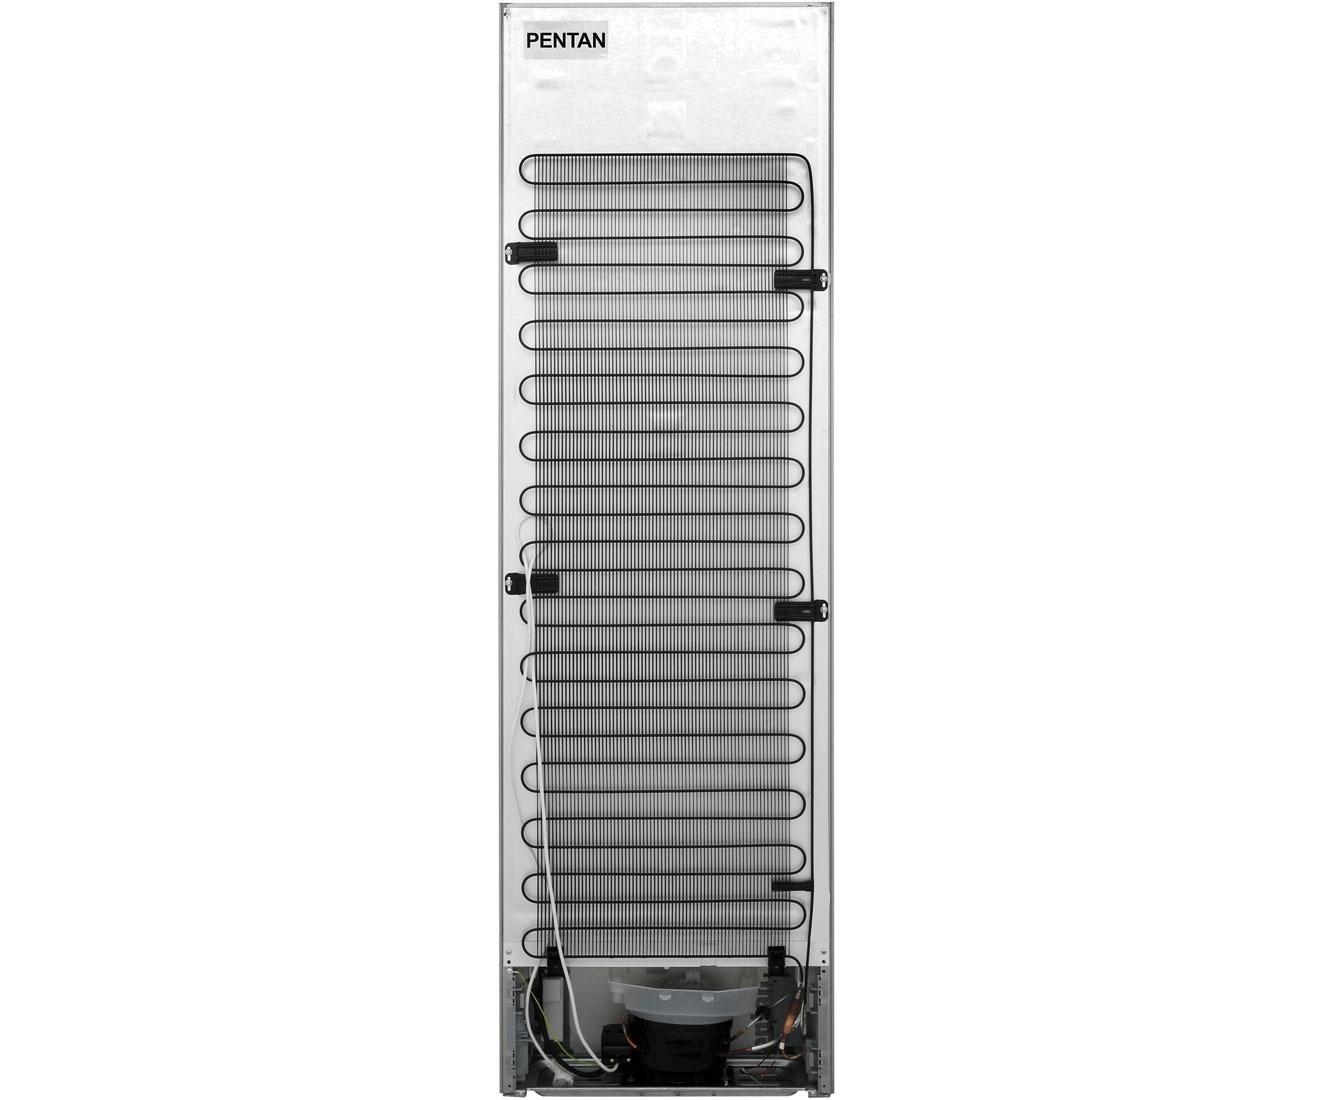 Bosch Kühlschrank Idealo : Bosch kgv vl a kühl gefrierkombination edelstahl optik a